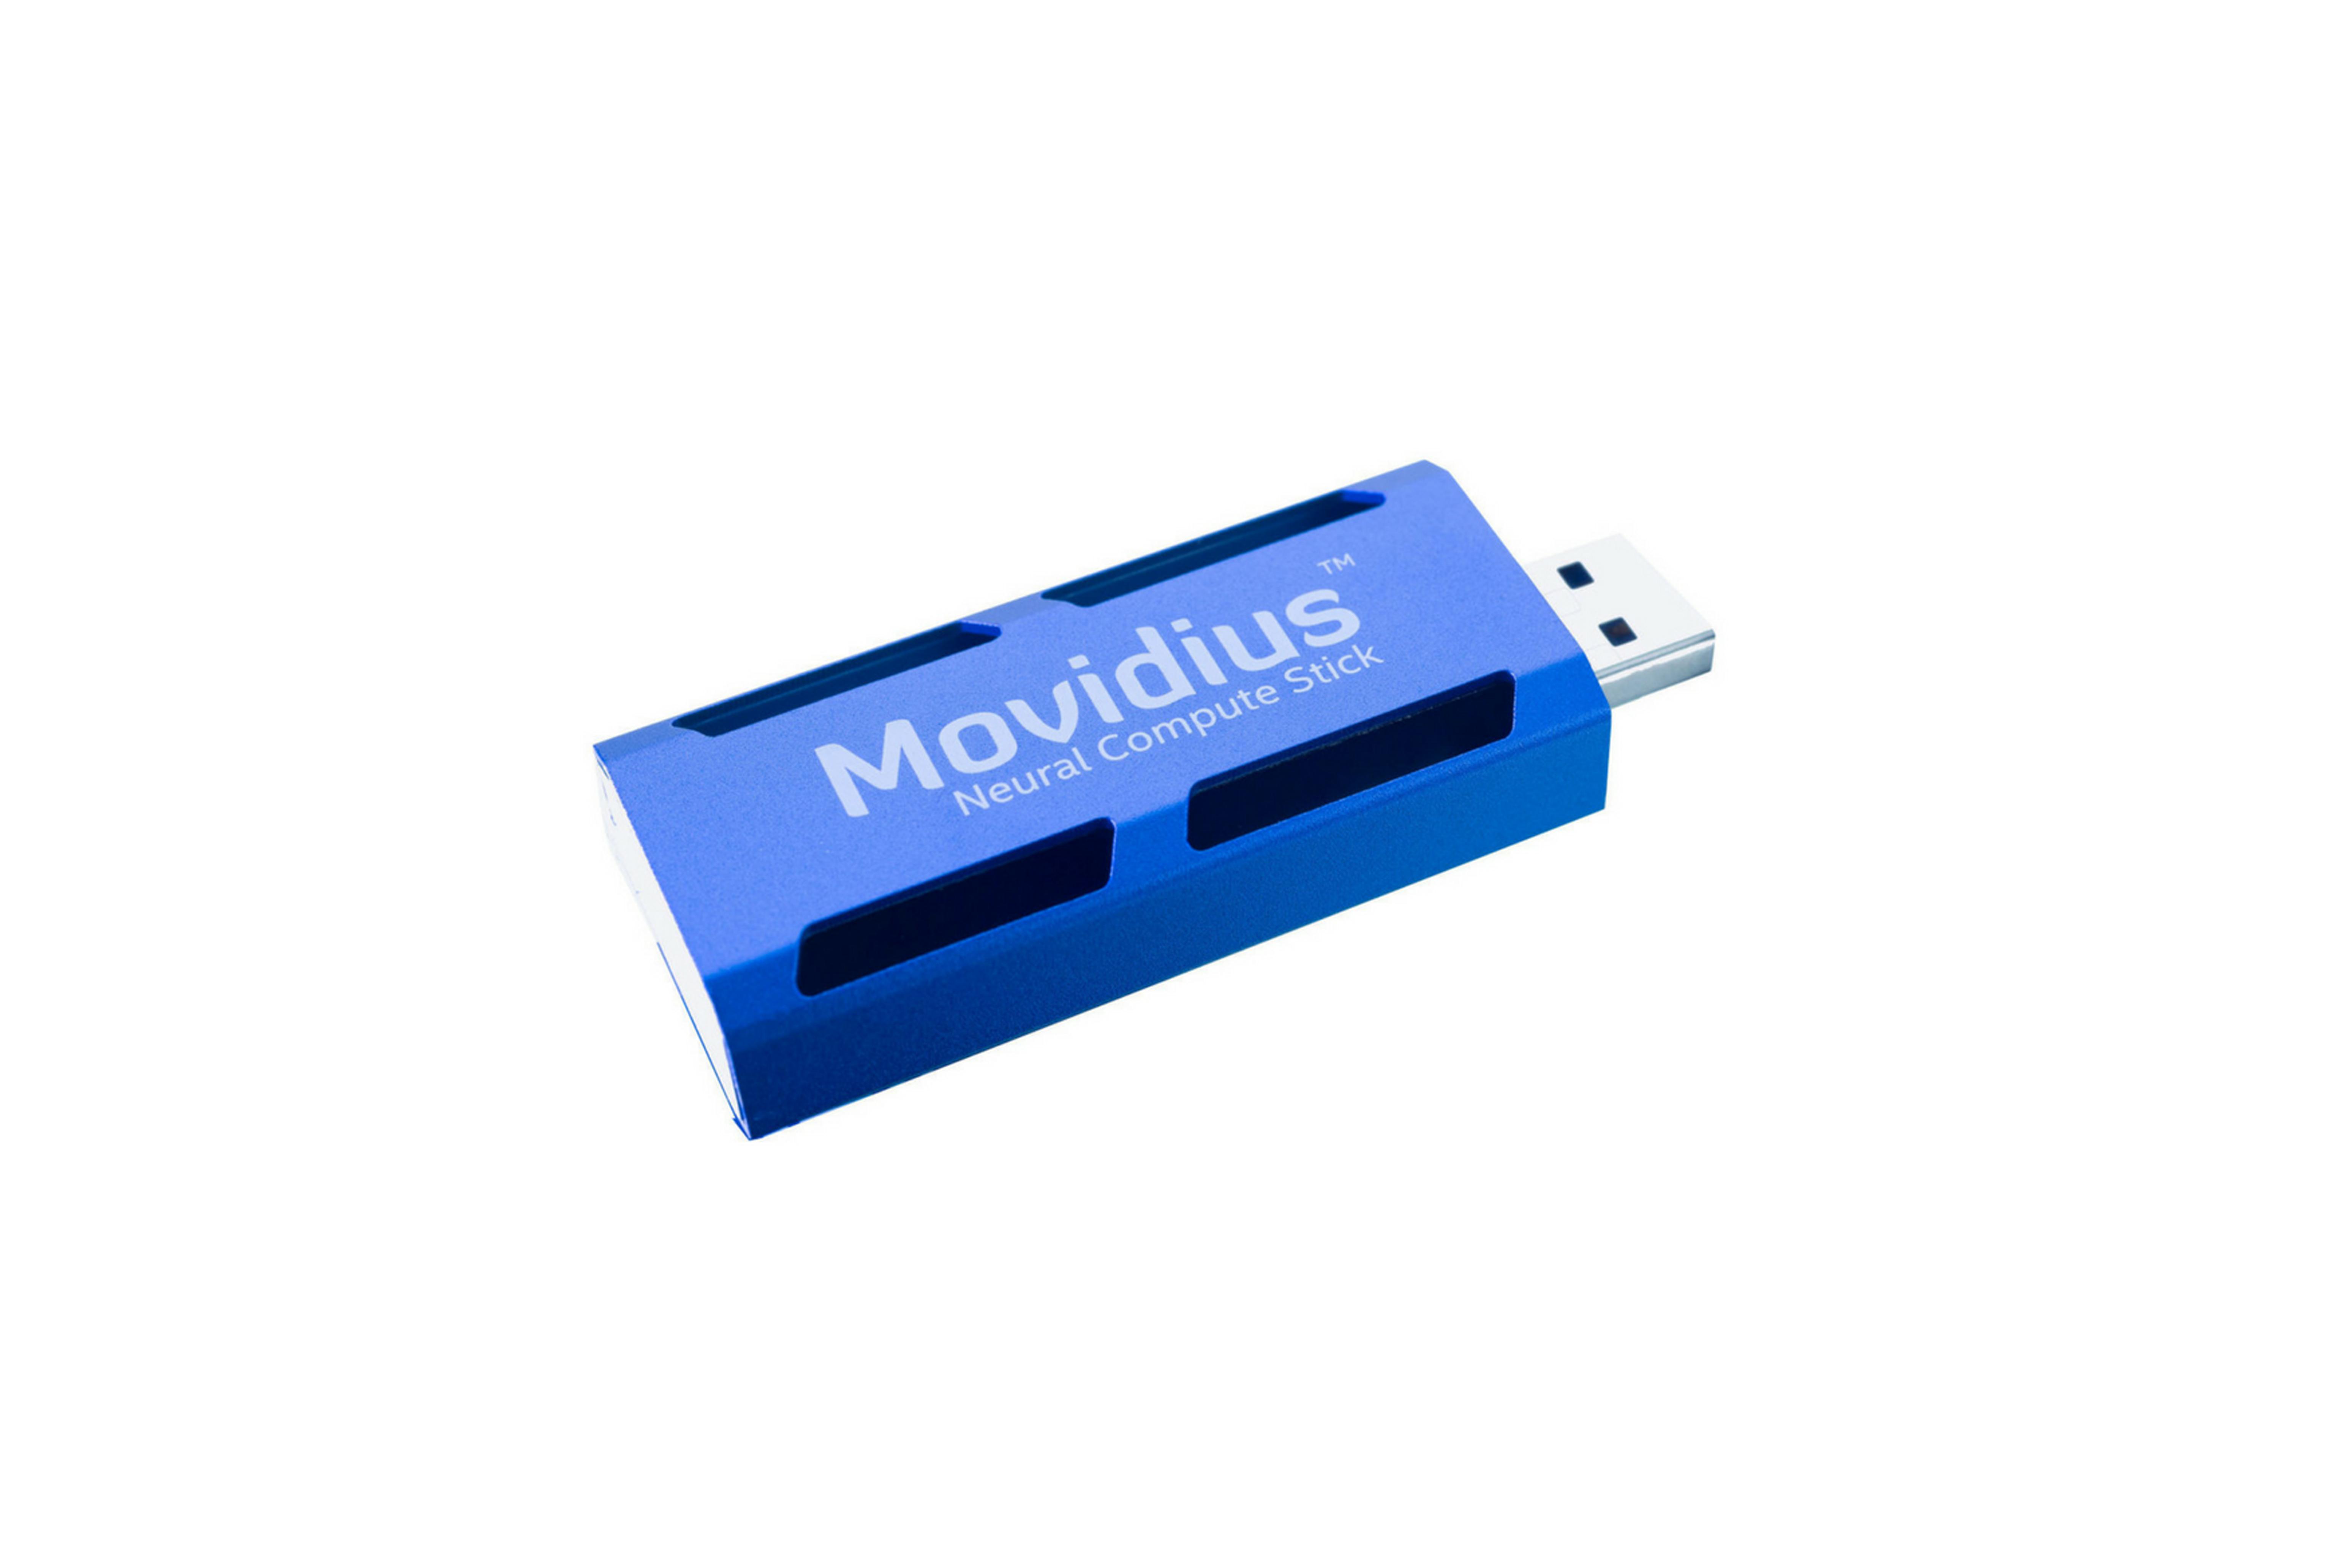 Intel® Movidius™ Neural Compute Stick